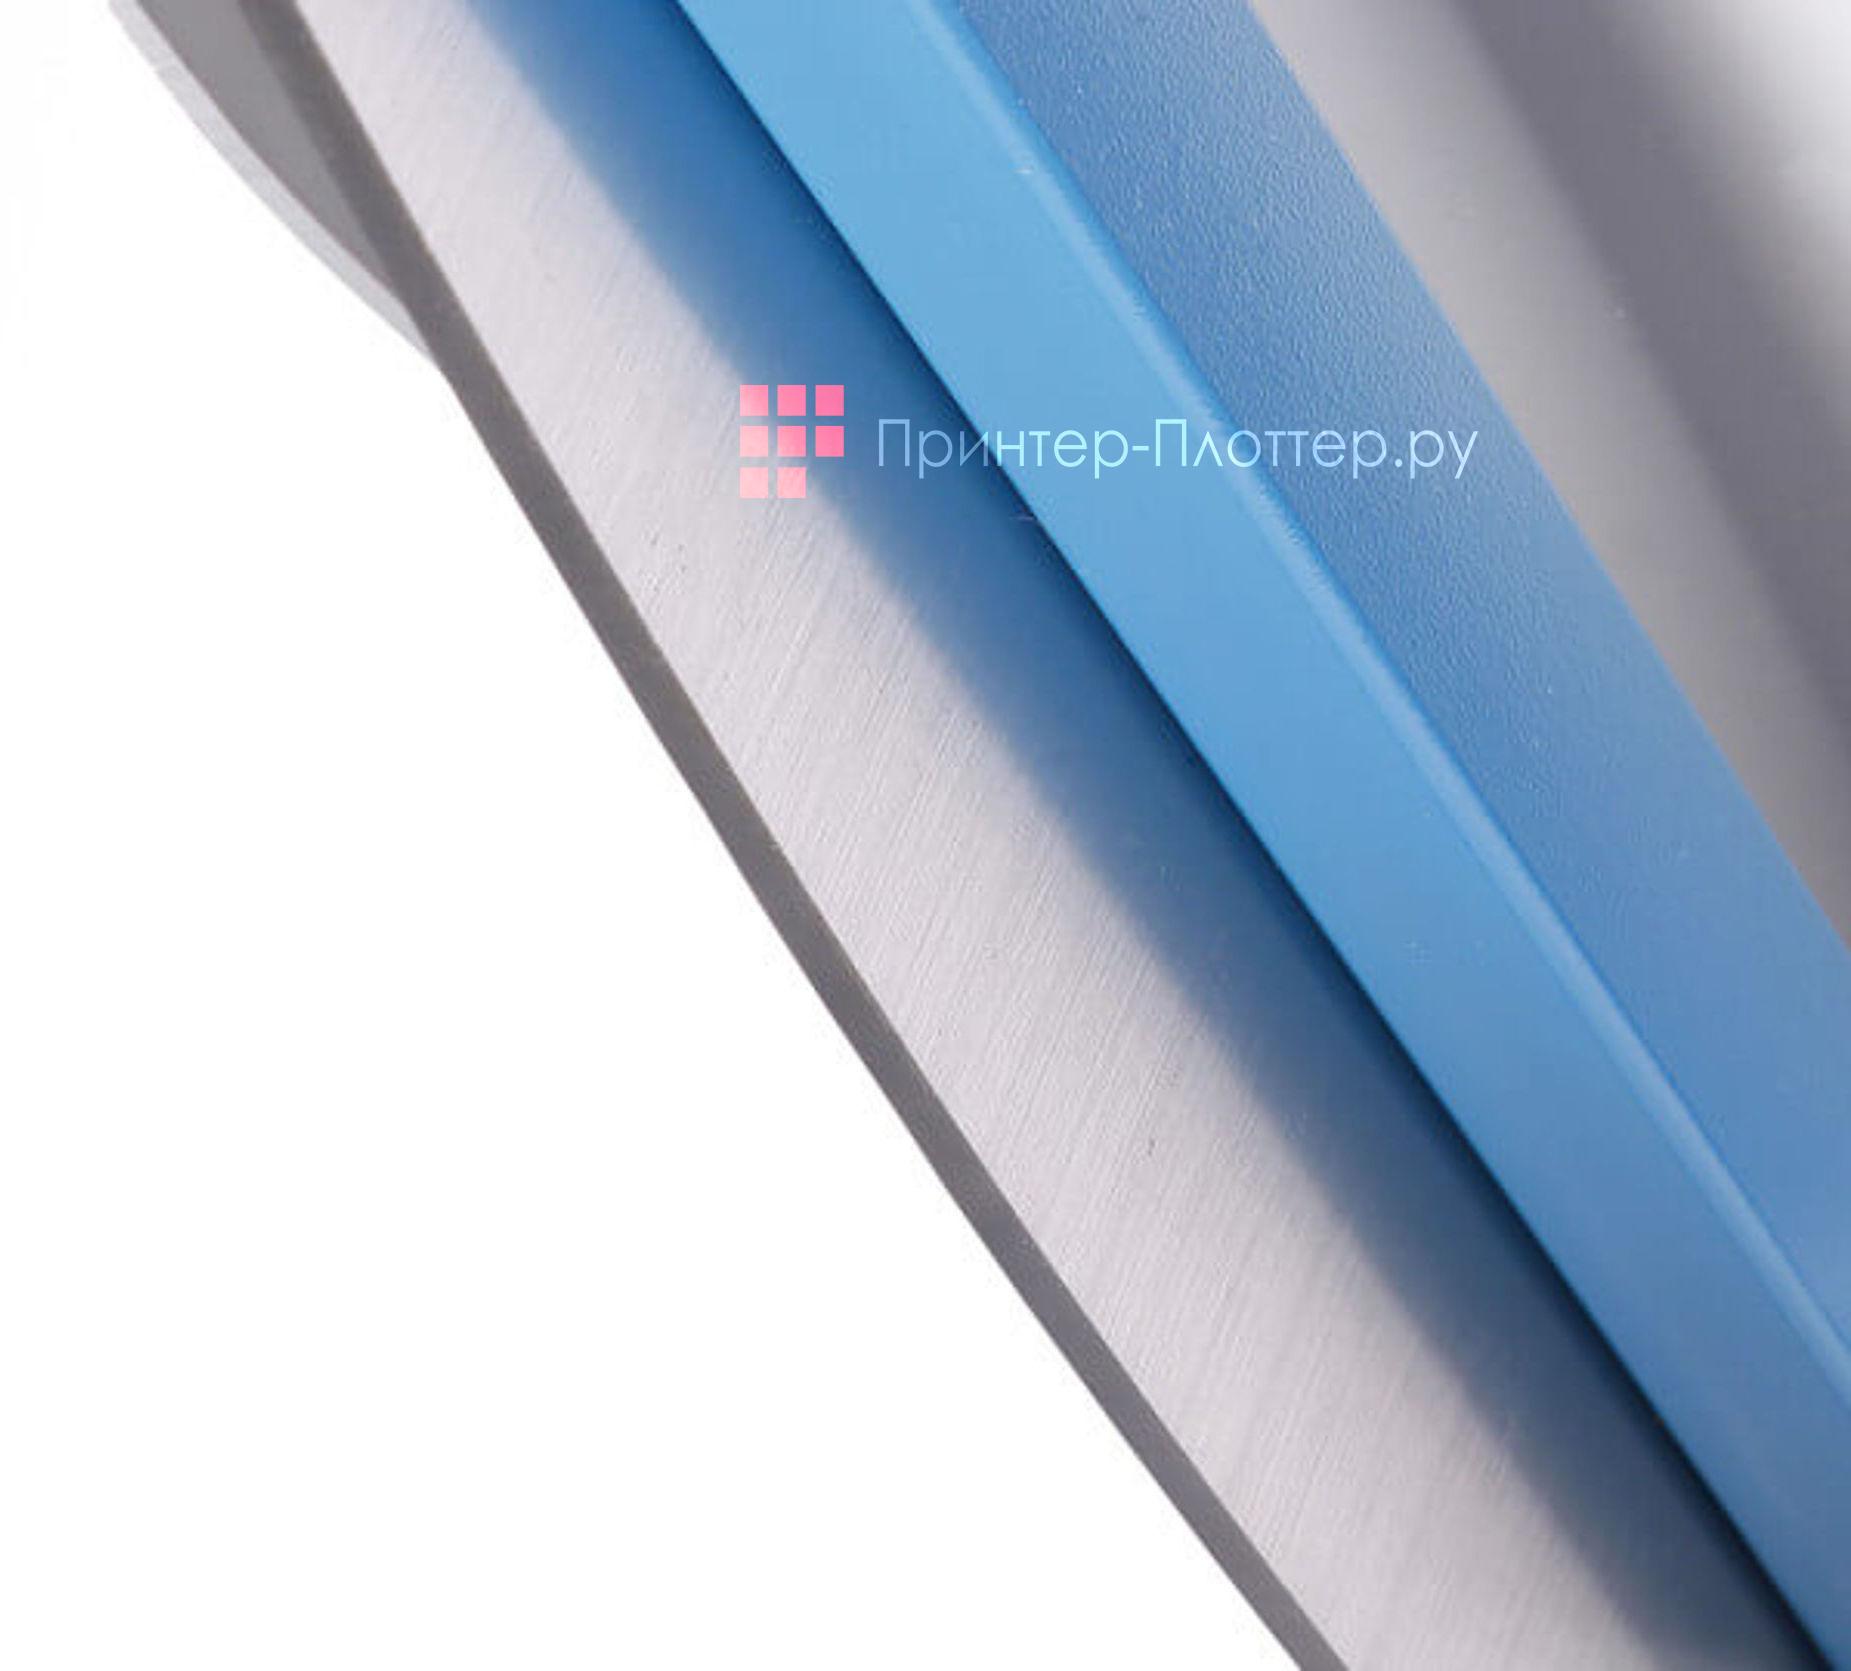 Dahle 519. Нож для материалов